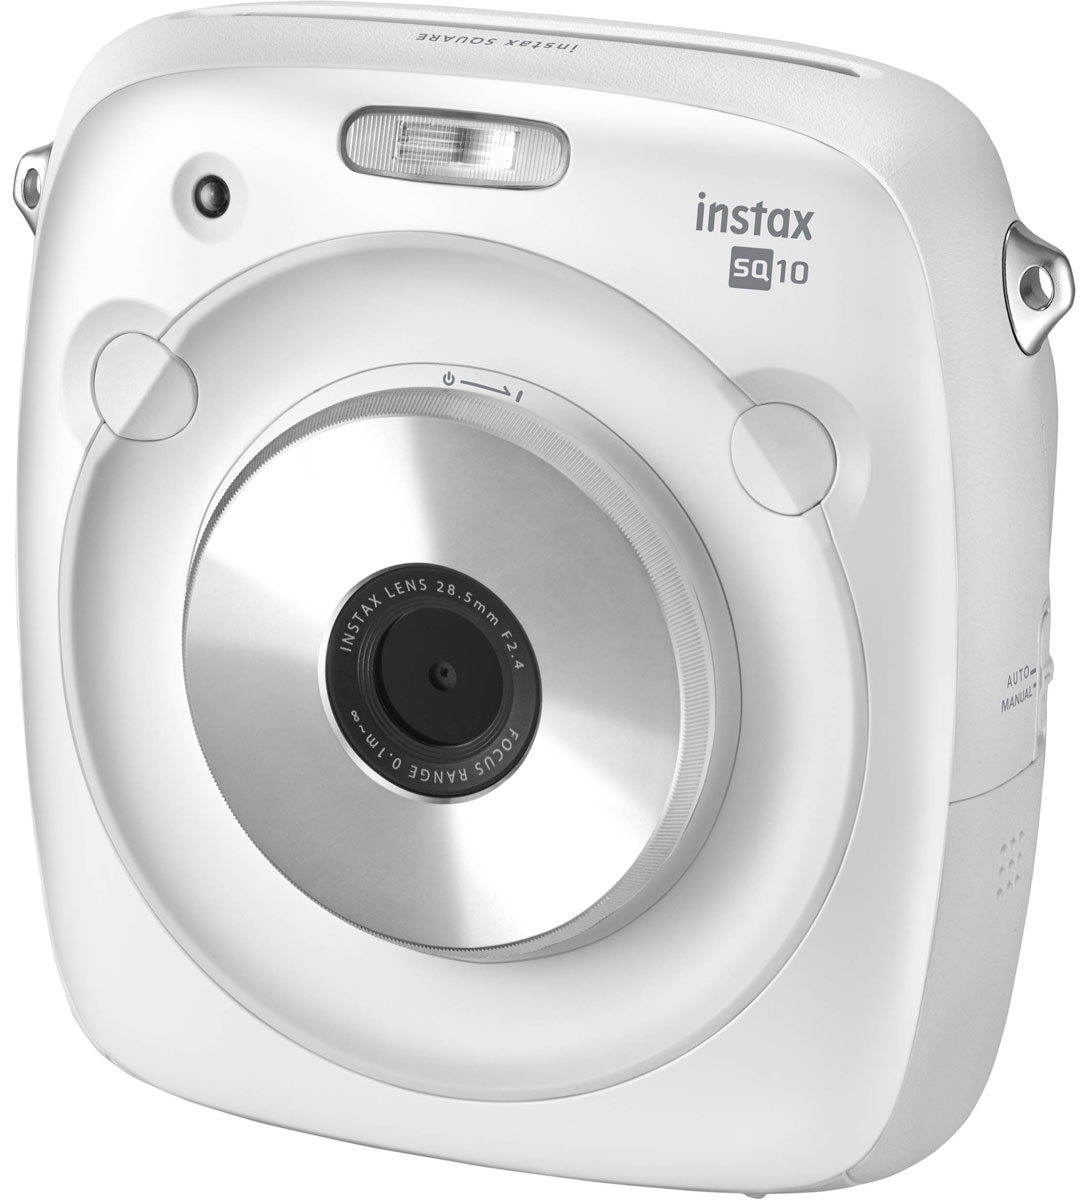 Fujifilm Instax Square 10, White фотокамера мгновенной печати